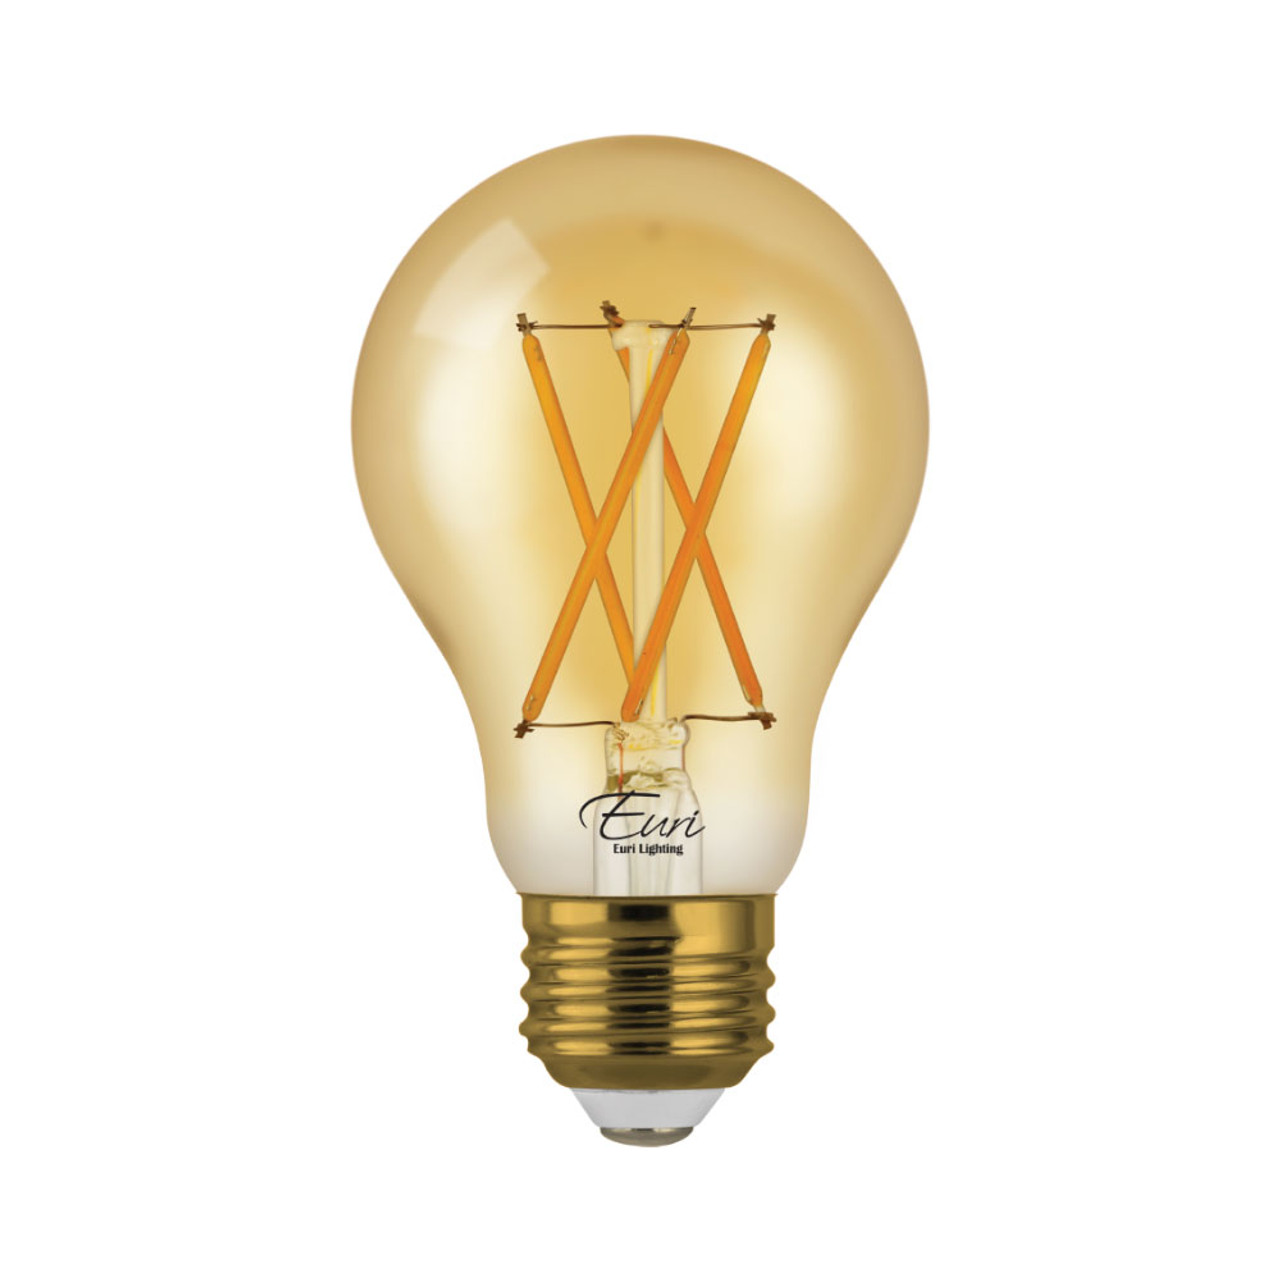 A19, Omni-Directional, LED Light Bulb, Dimmable, 7 W, 120 V, 600 lm, 2200 K, E26 Base (VA19-3020ea